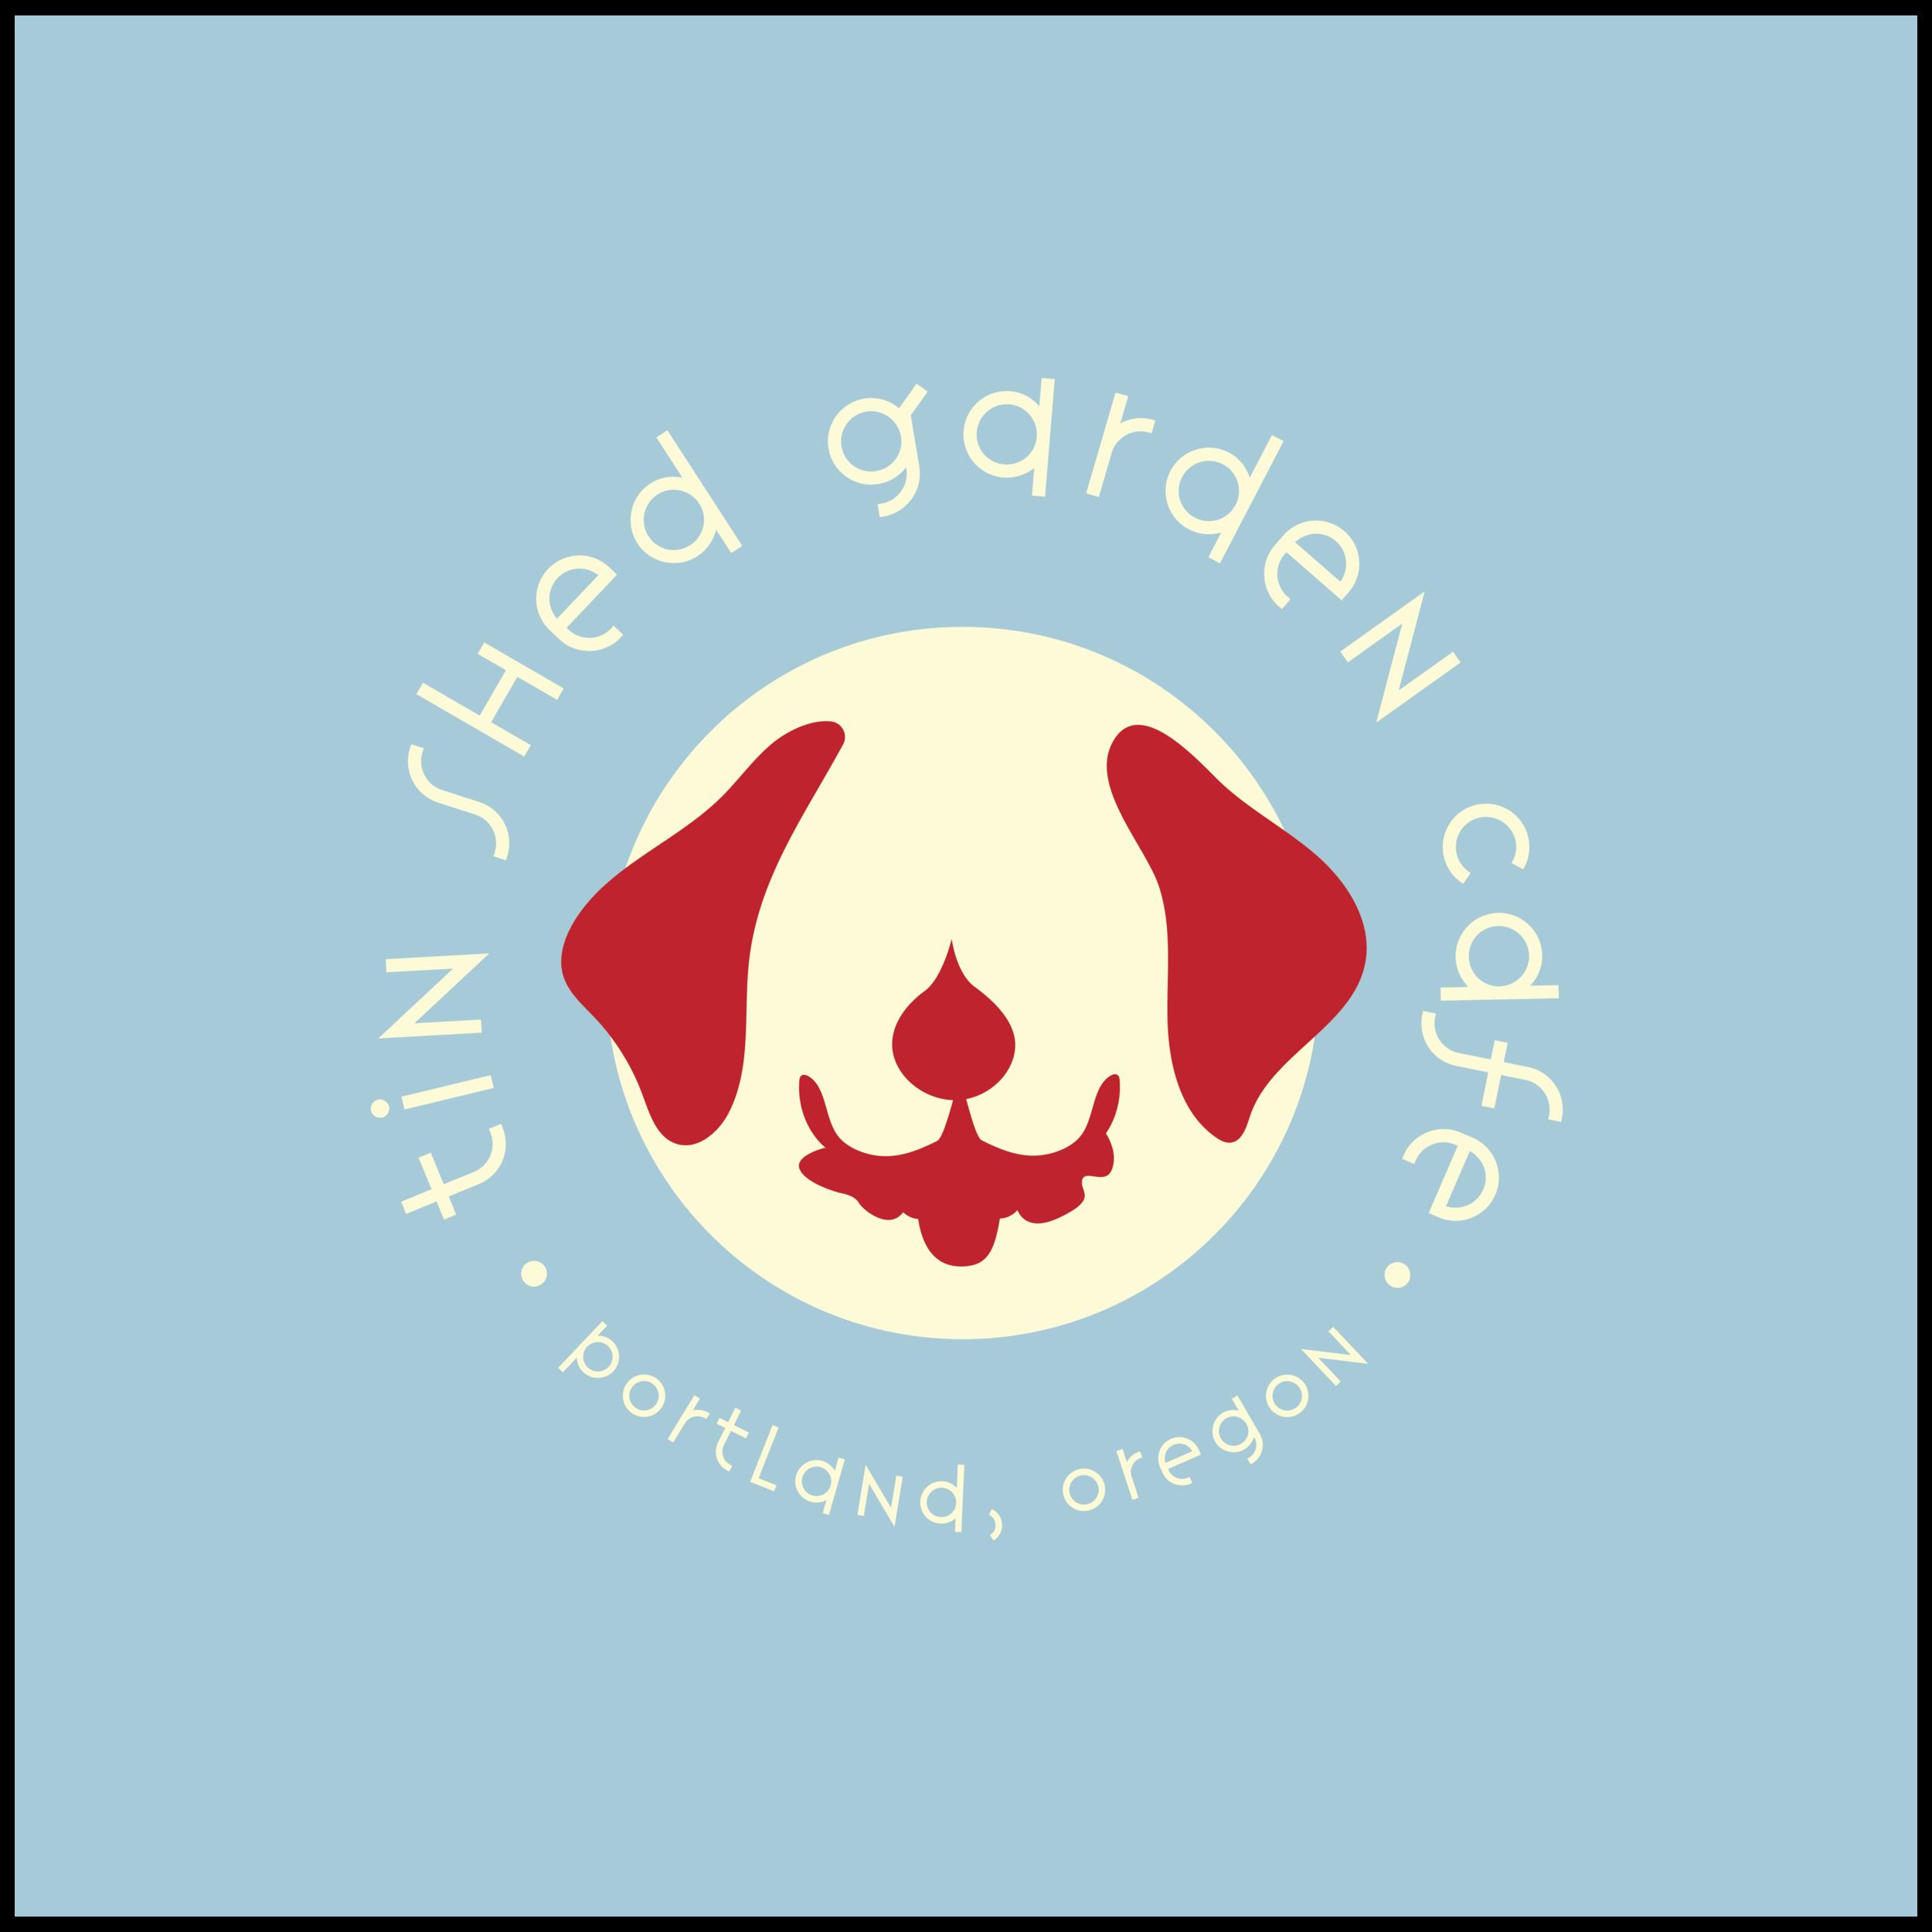 Tin Shed Garden Cafe Branding Summer Bockart